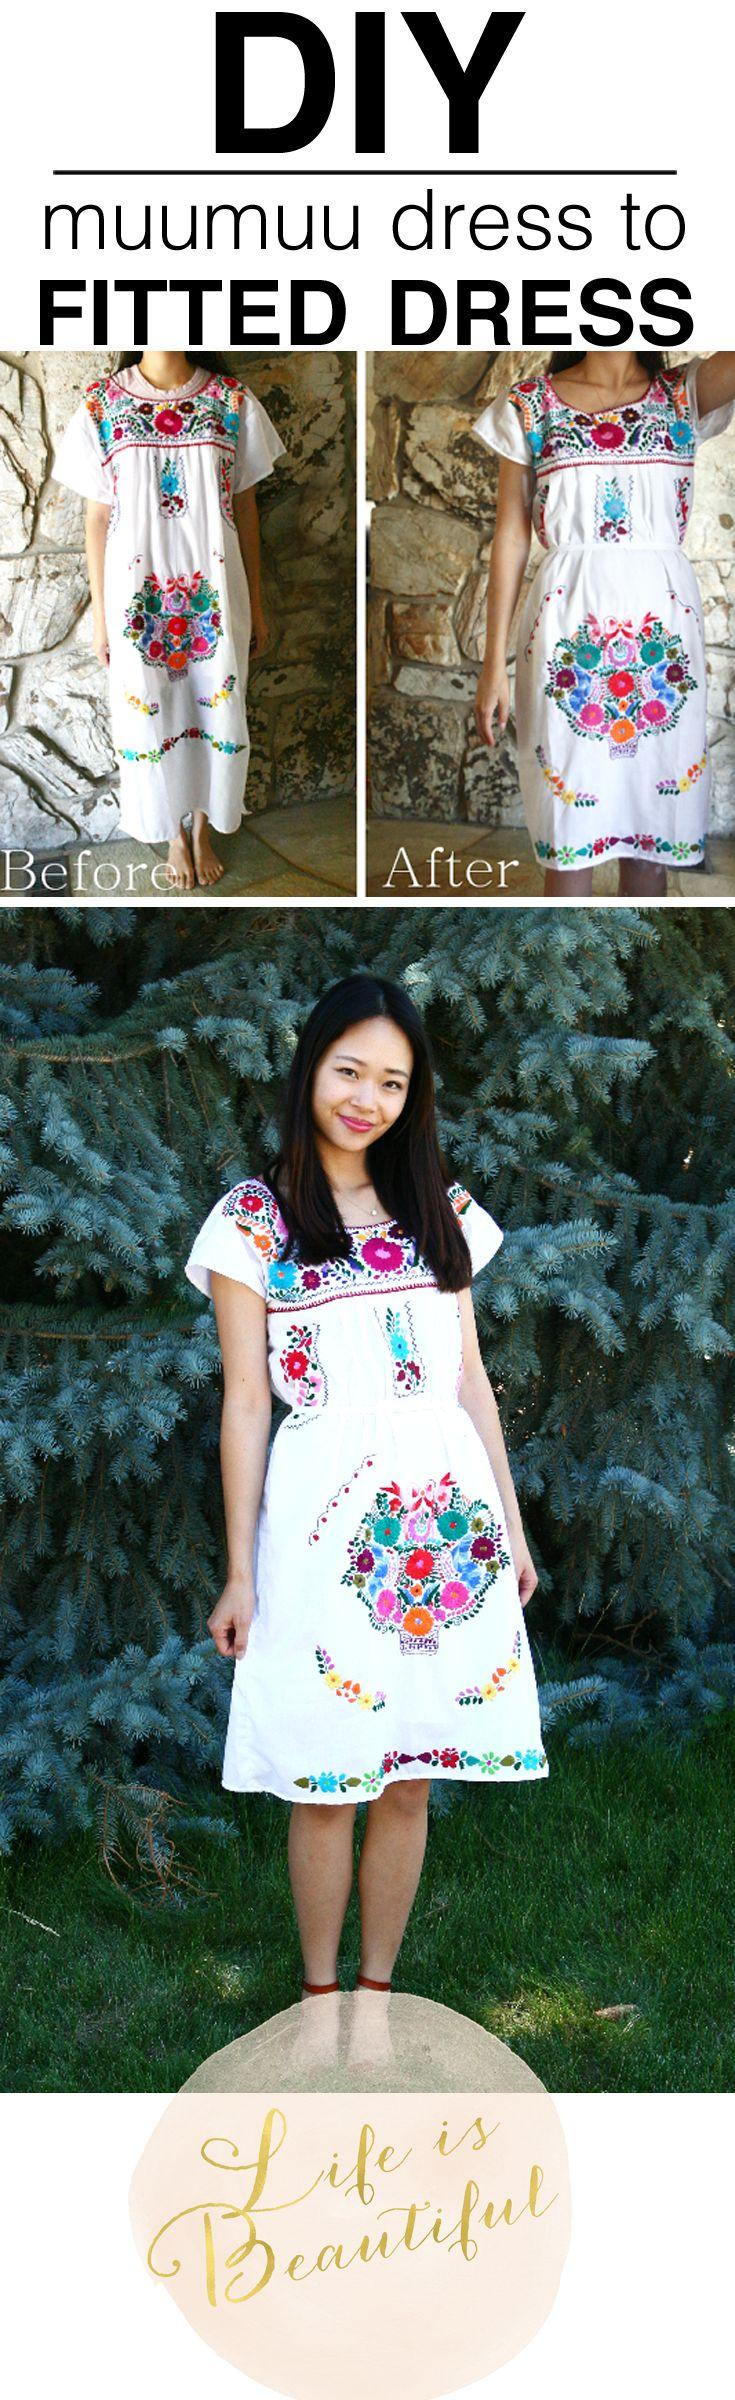 DIY Refashion: Muumuu Dress to Fitted Dress